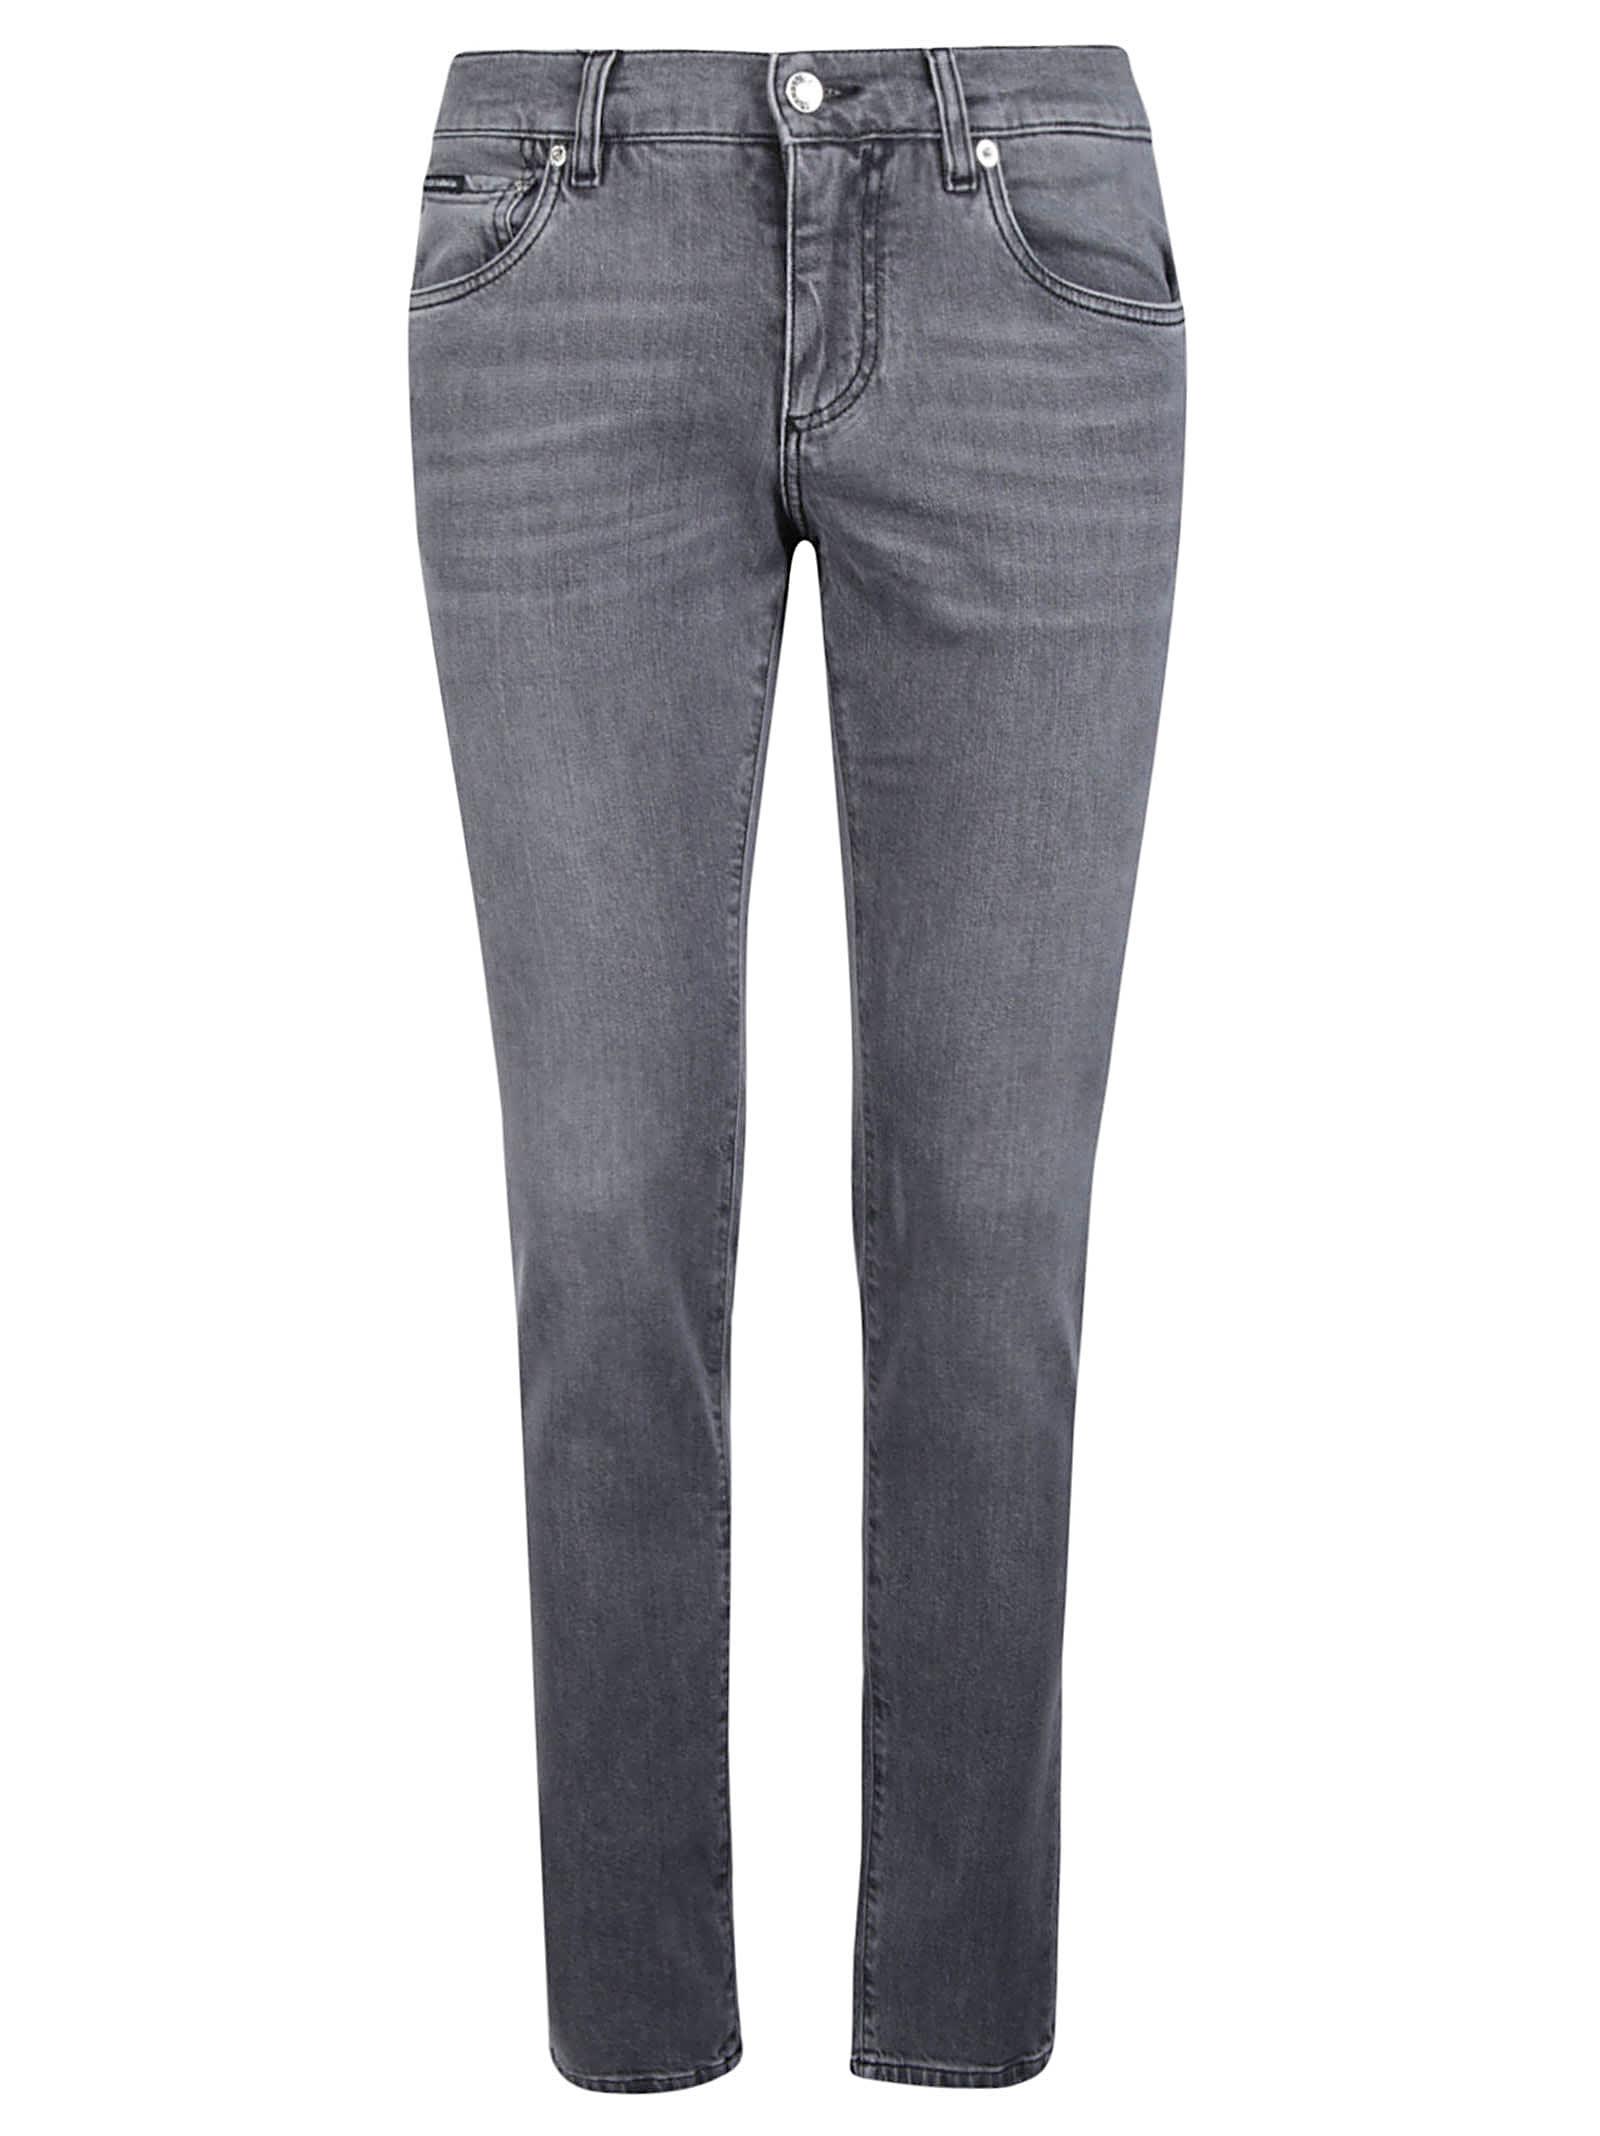 Dolce & Gabbana Stonewashed 5 Pockets Slim Jeans In Variante Abbinata